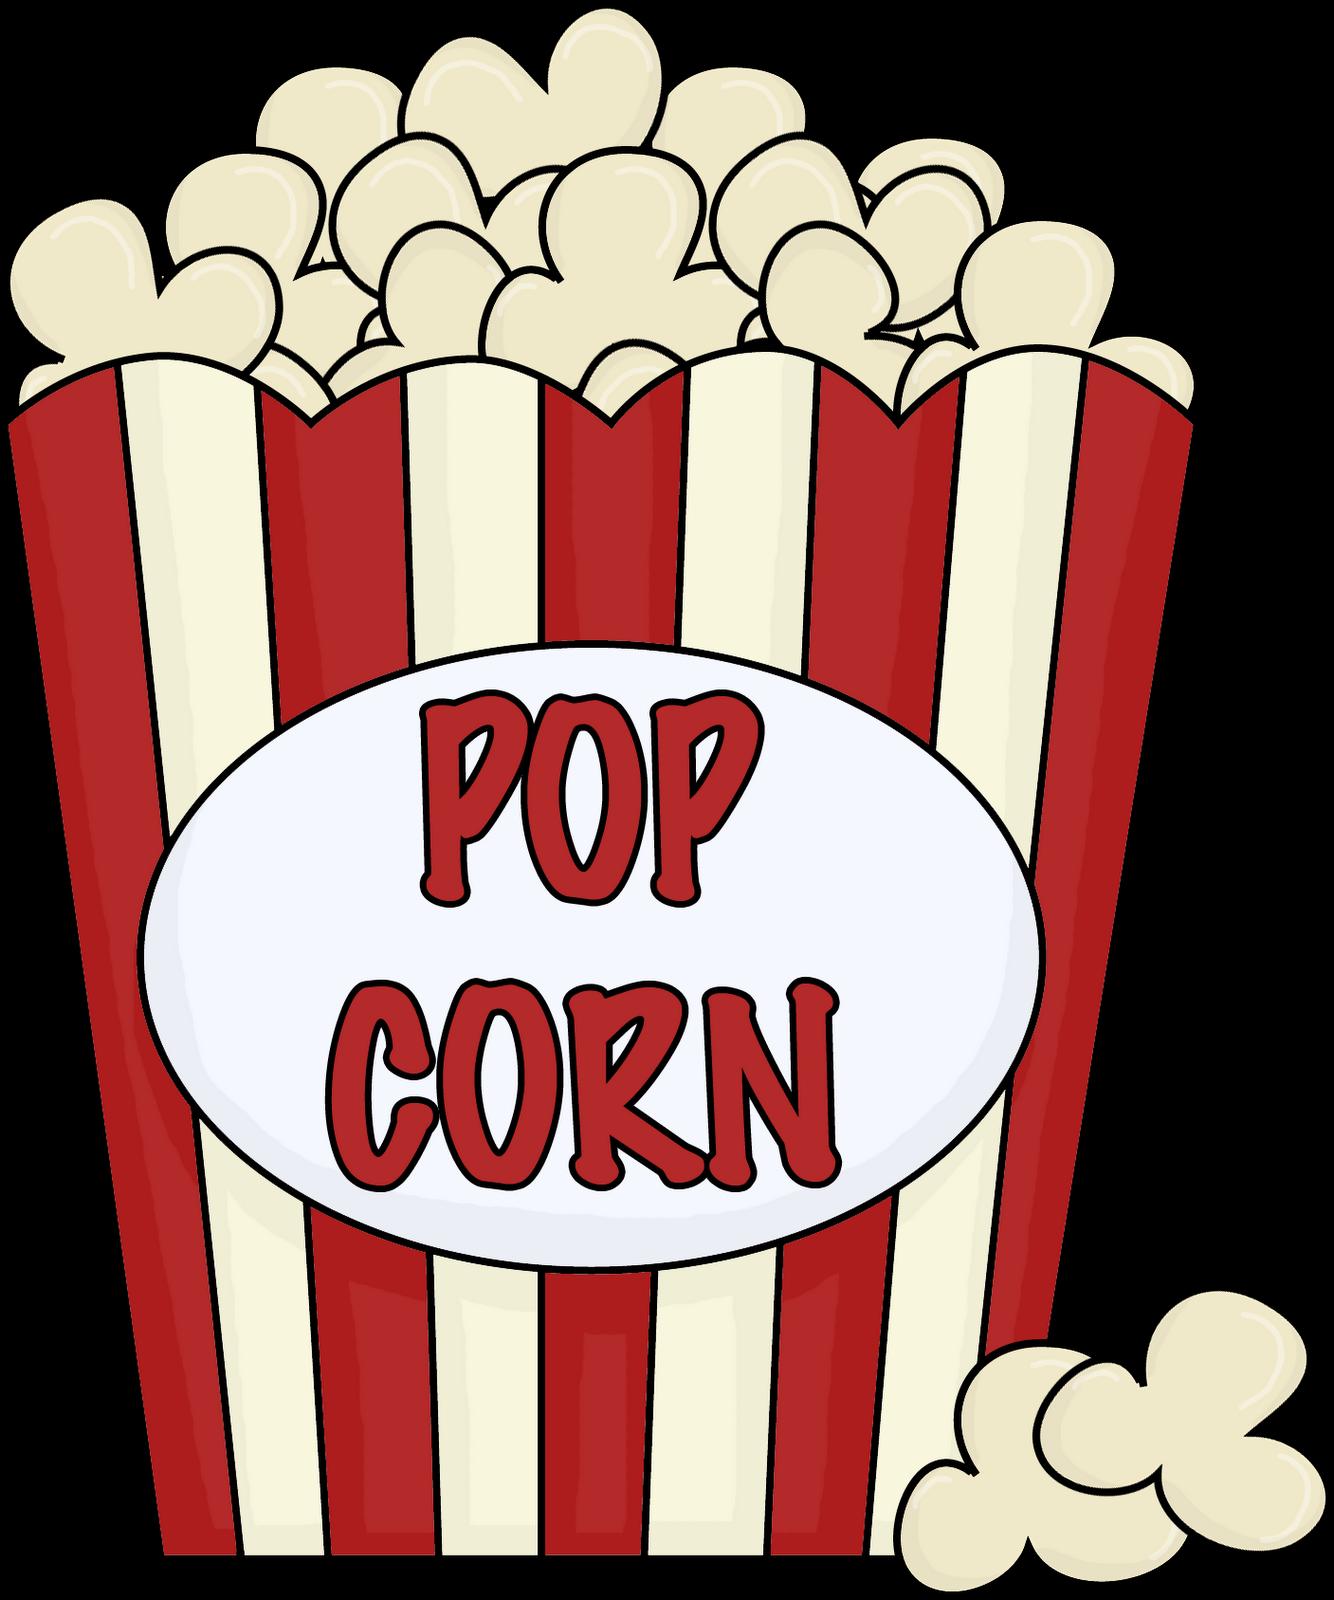 Popcorn Box Clip Art.